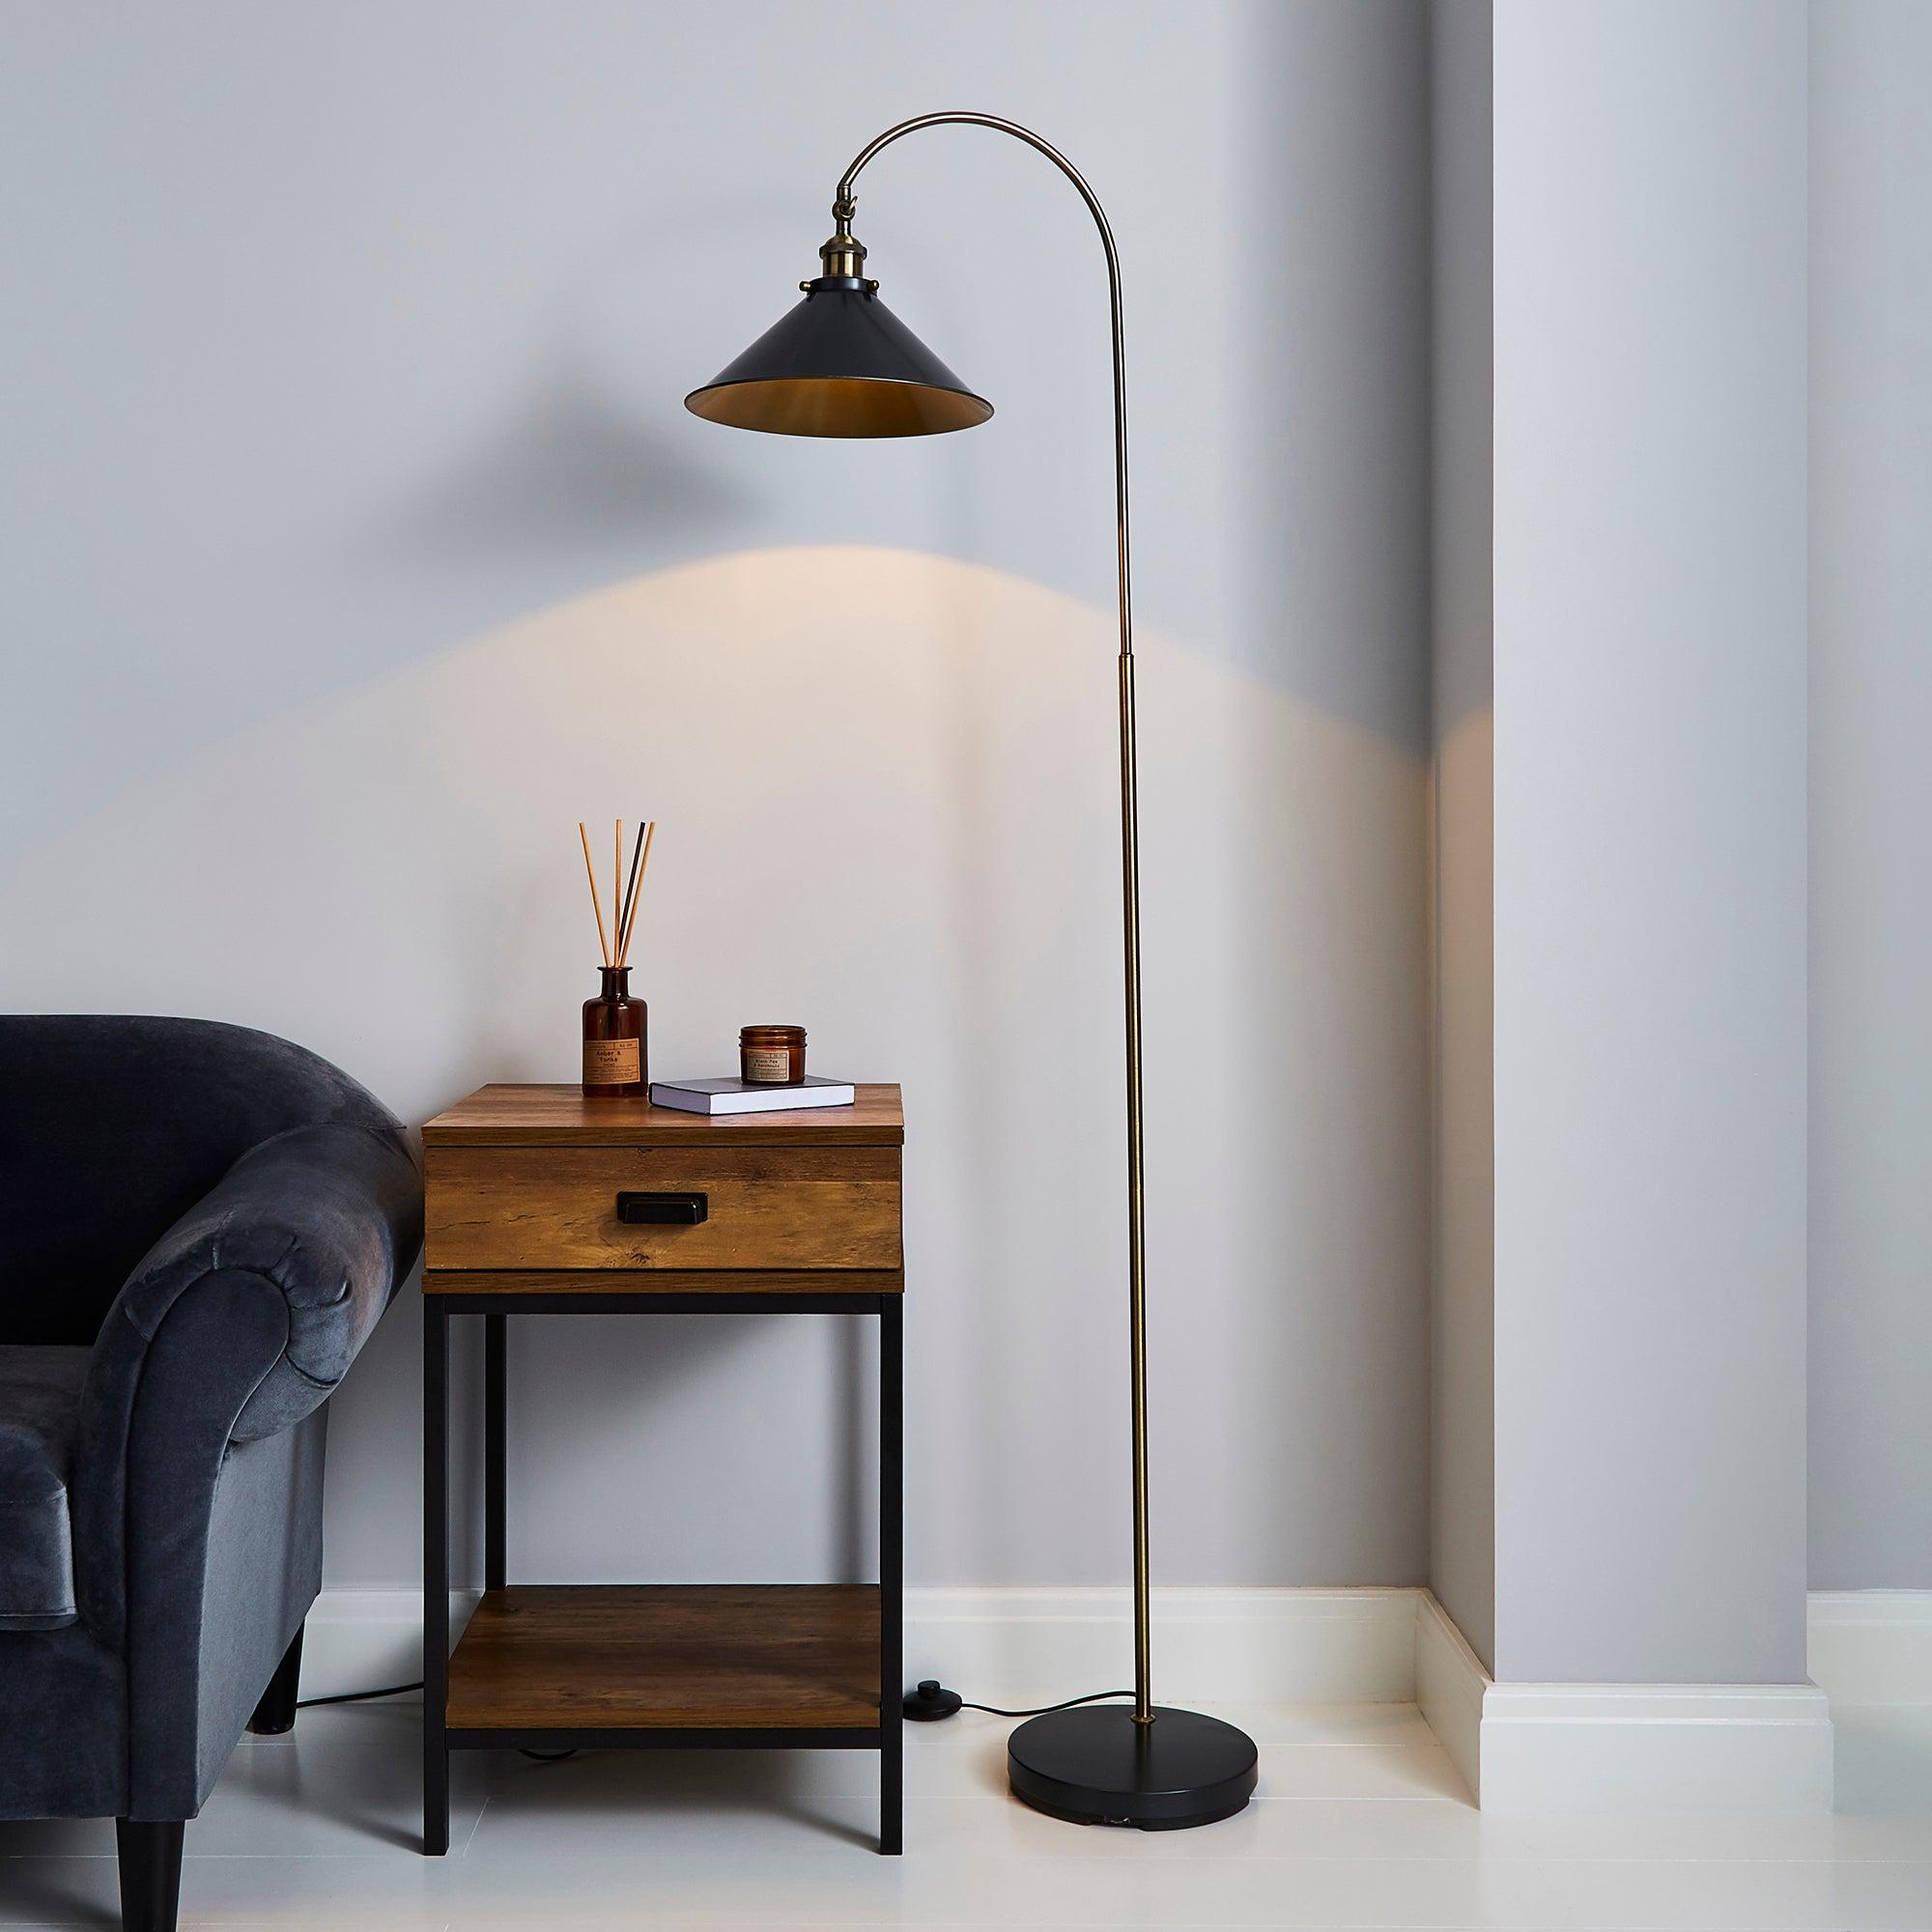 Logan Grey Industrial Floor Lamp Dark industrial Nickel, Antique Brass